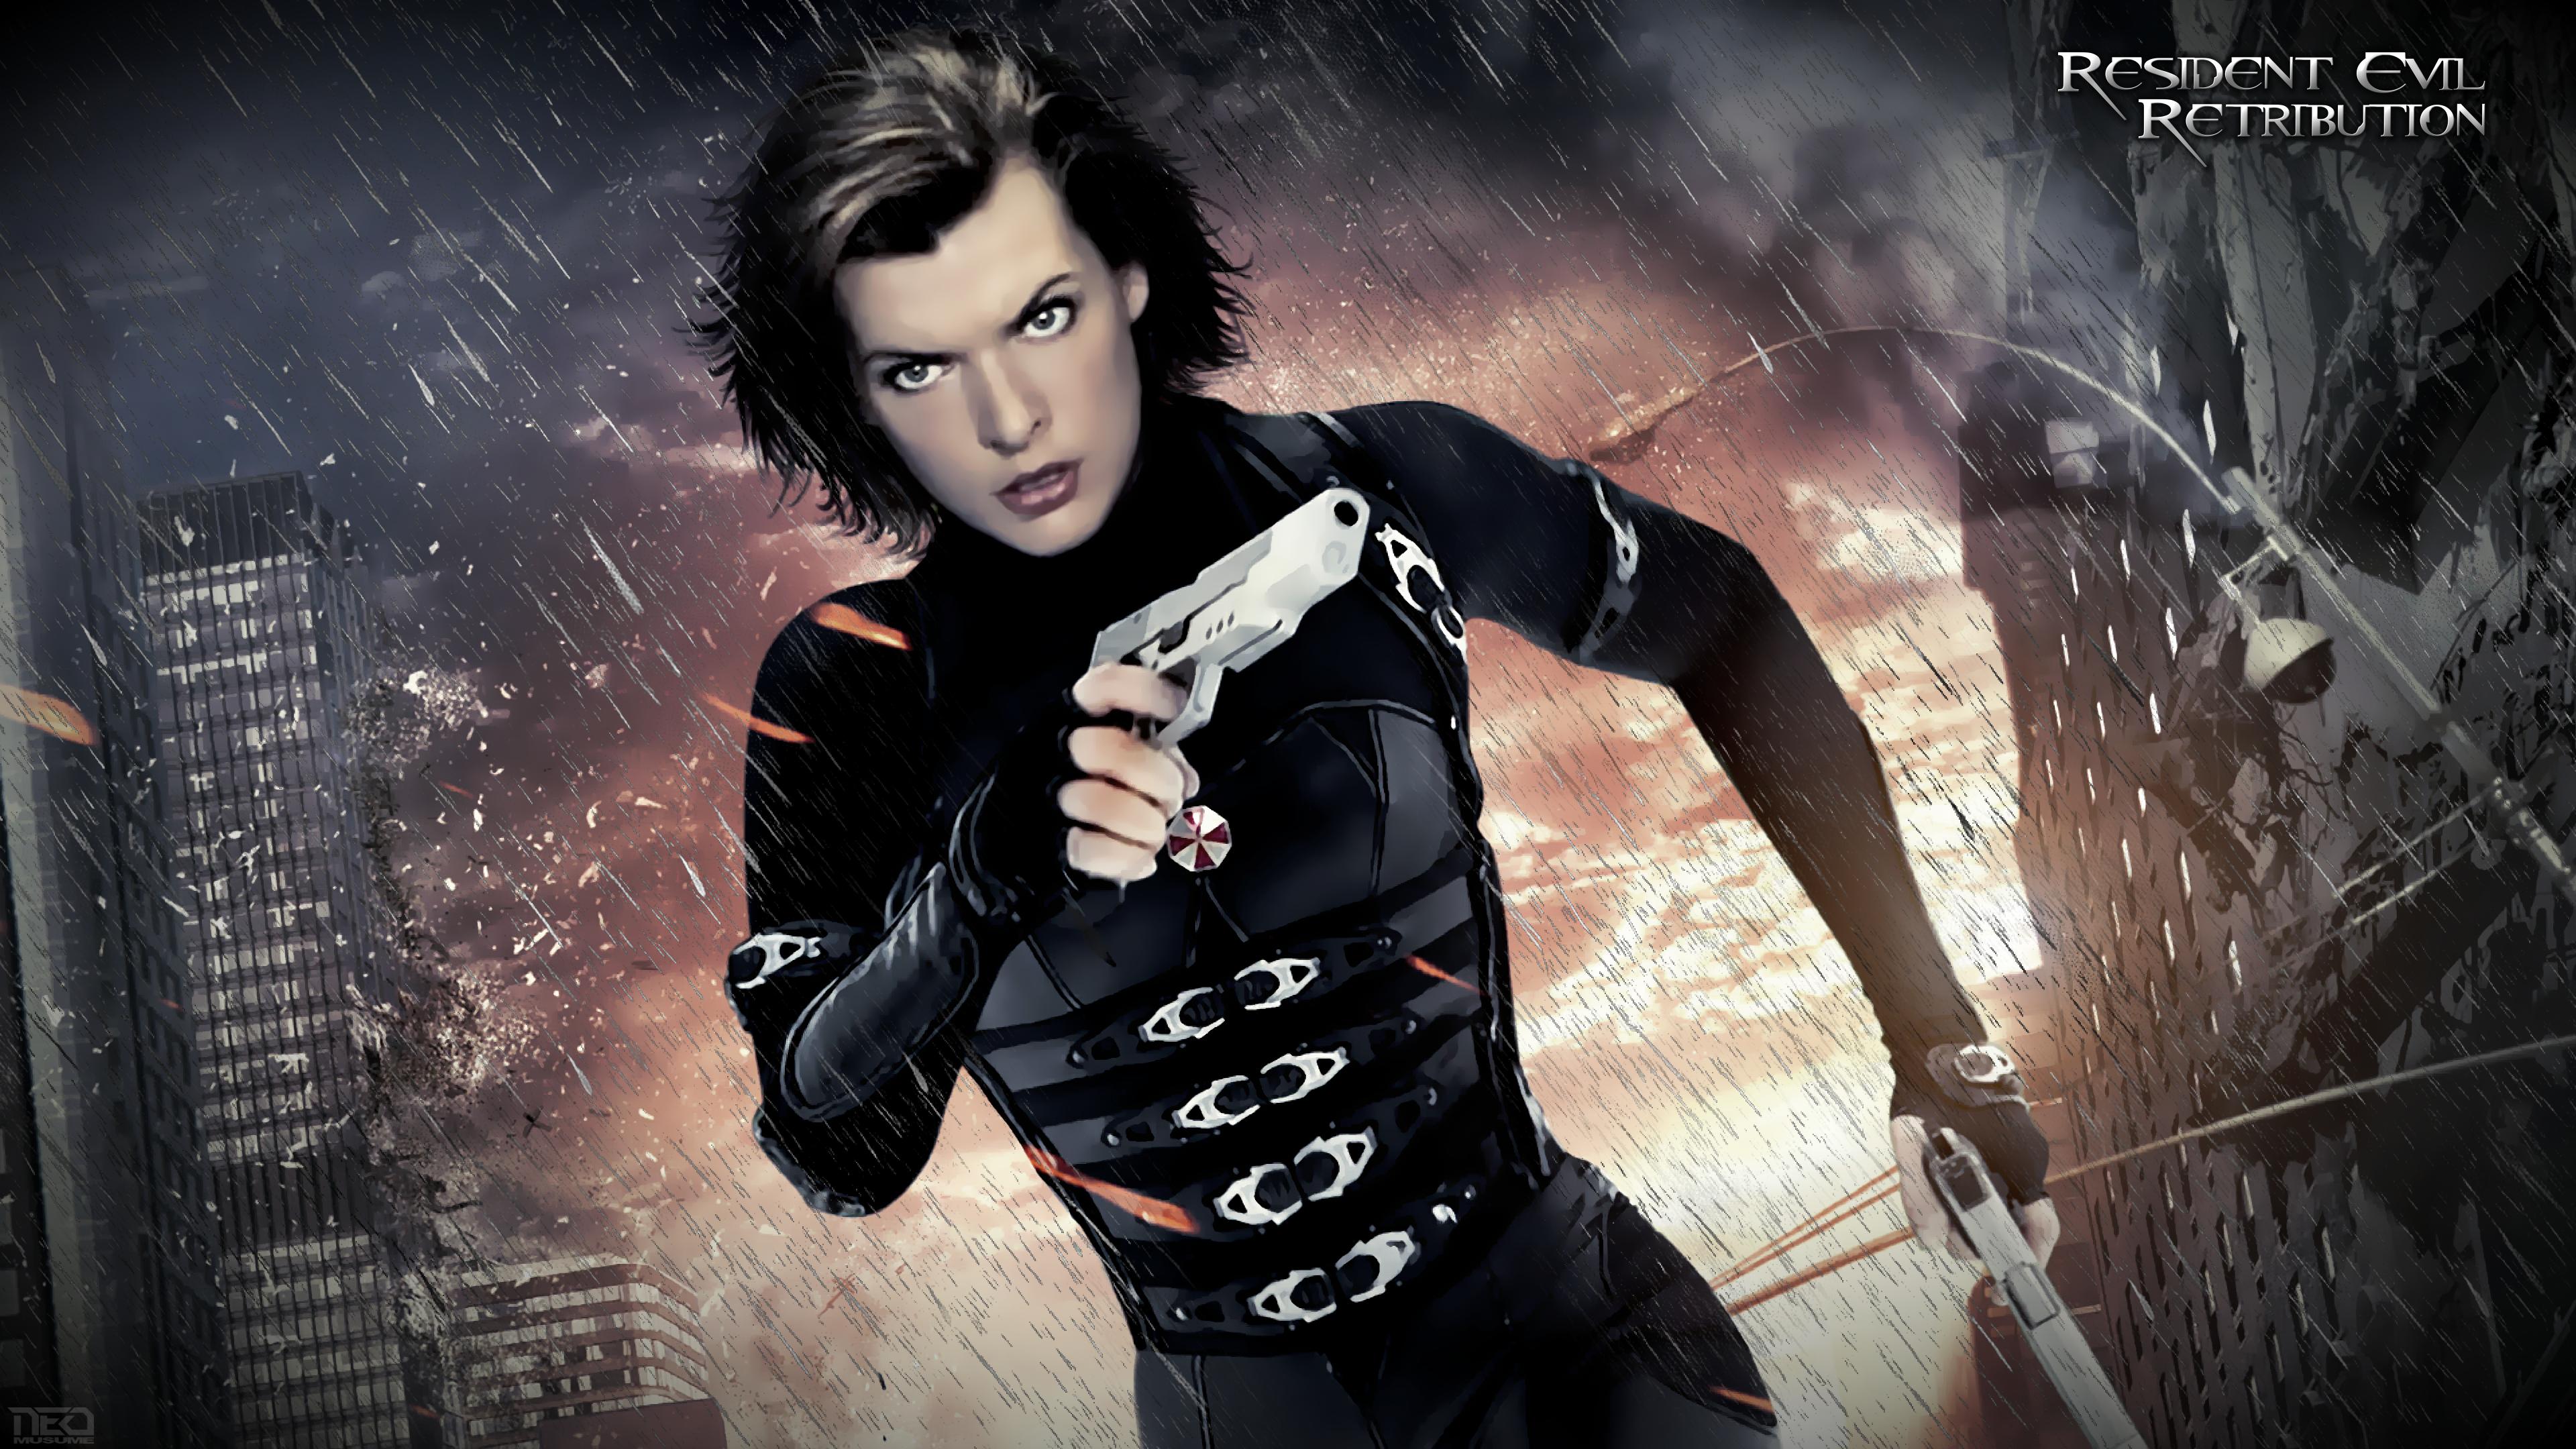 Resident evil retribution 4k by neo musume - Milla jovovich 4k wallpaper ...